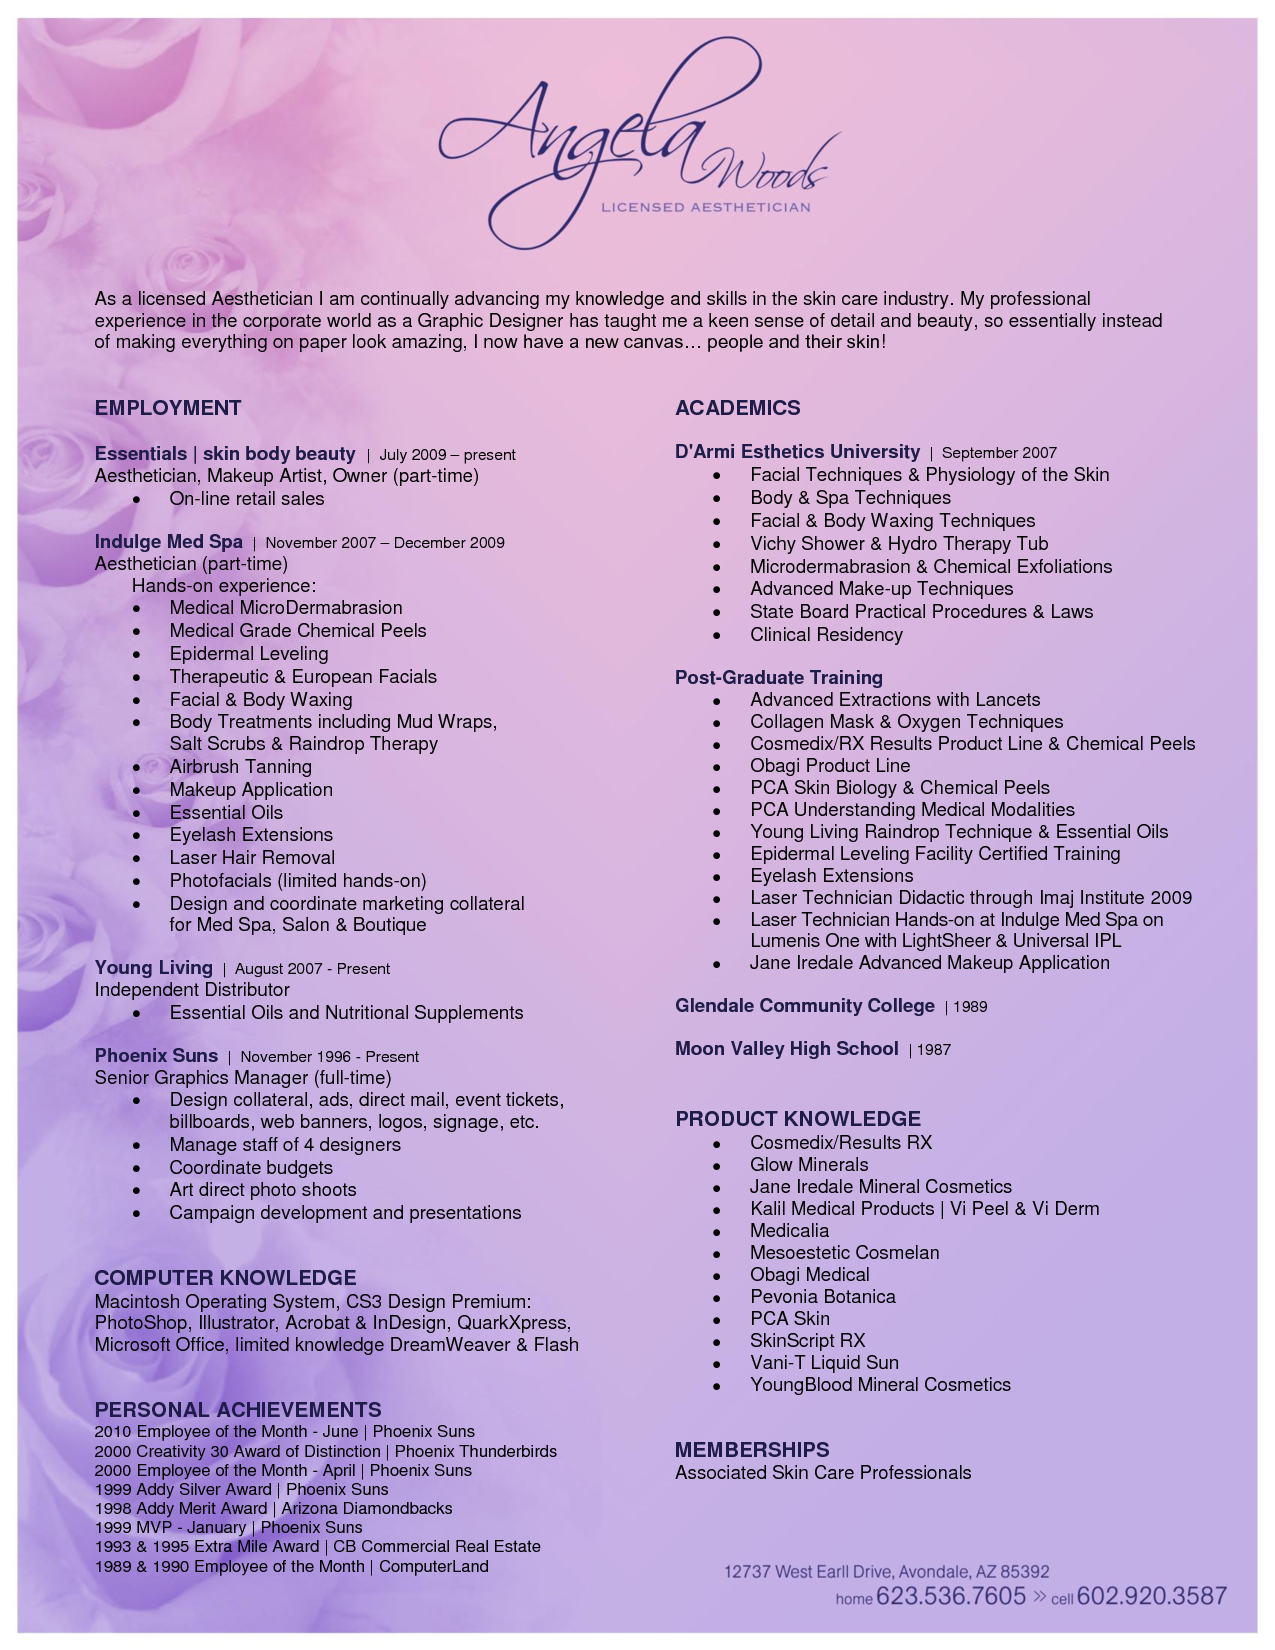 Aesthetic Resume Esthetician Resume Resume Examples Good Resume Examples